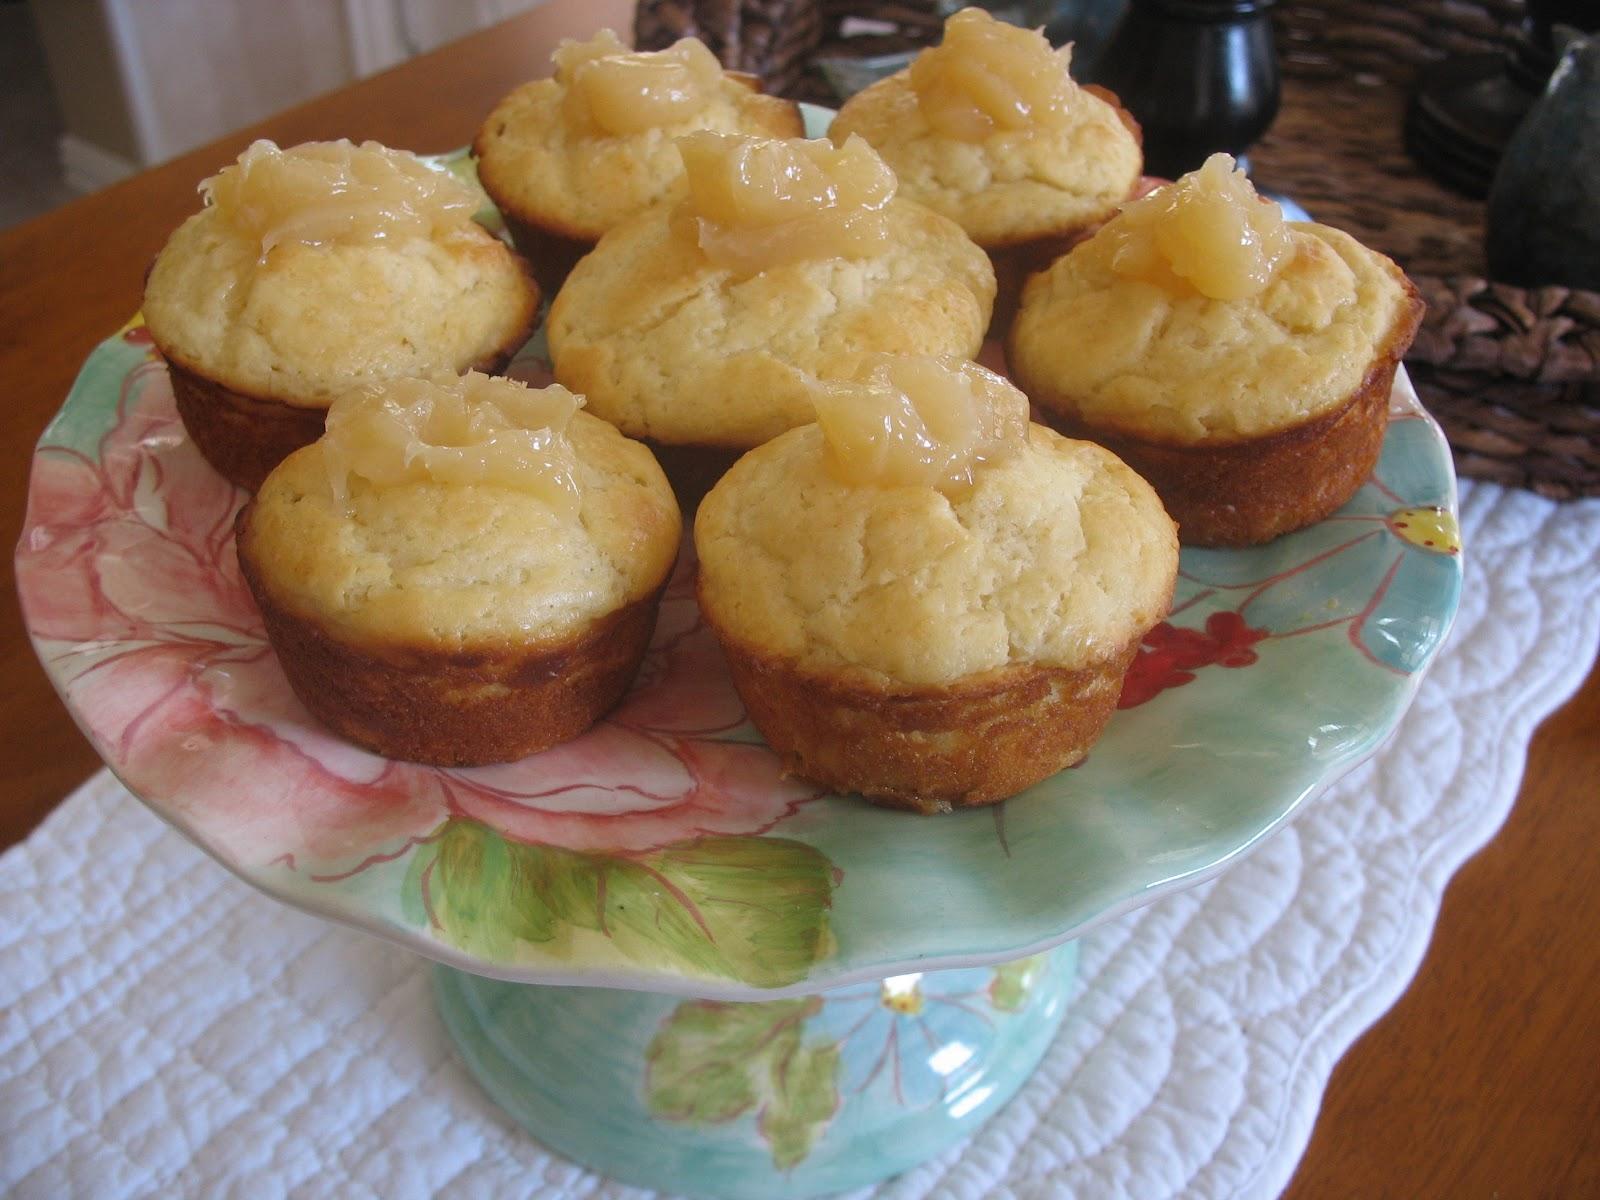 Estelle S Lemon Curd Yogurt Muffins